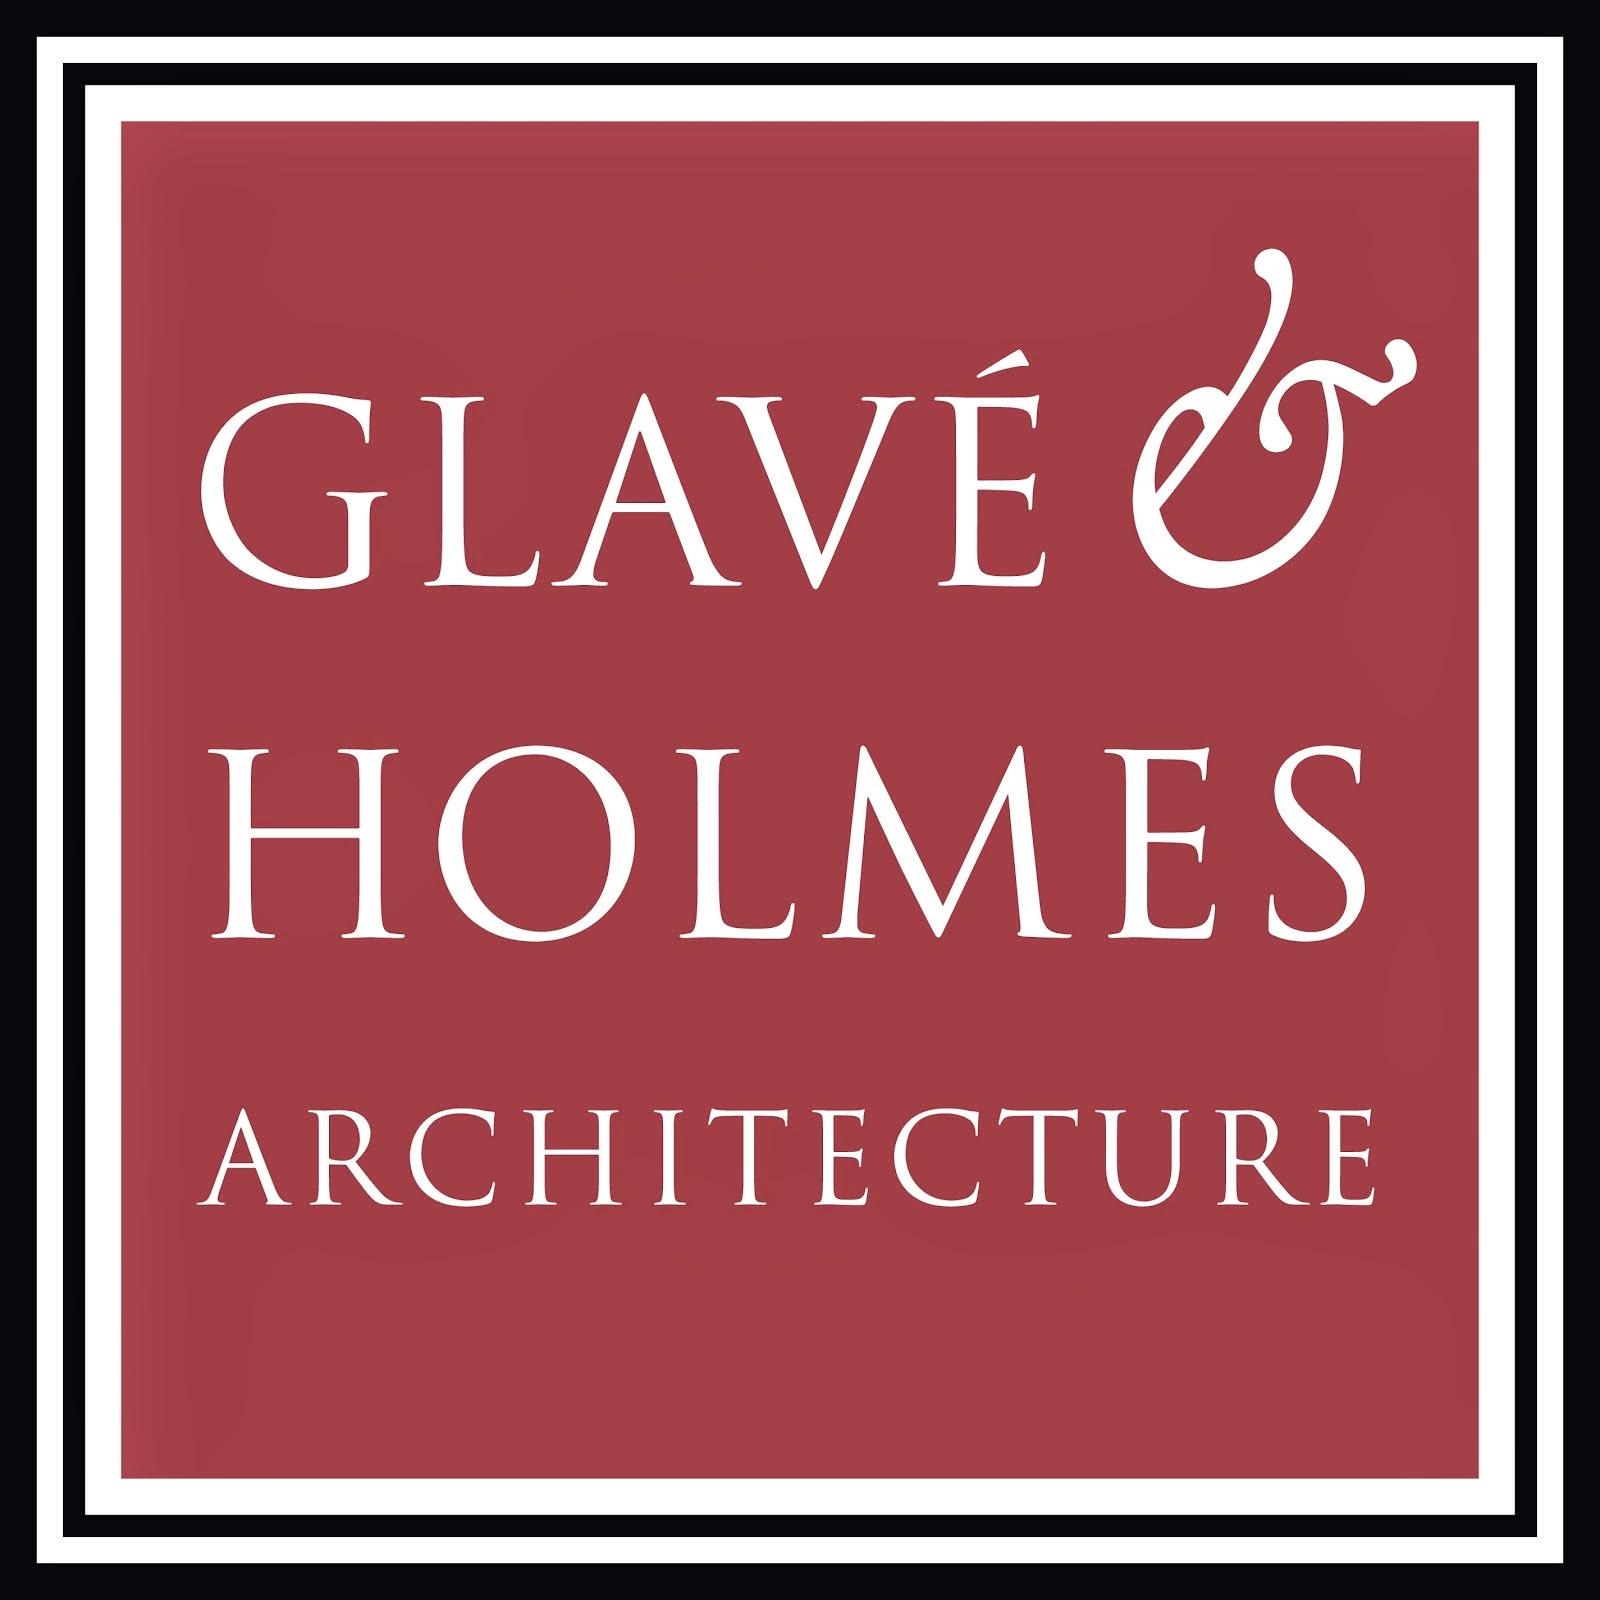 Glave' & Holmes